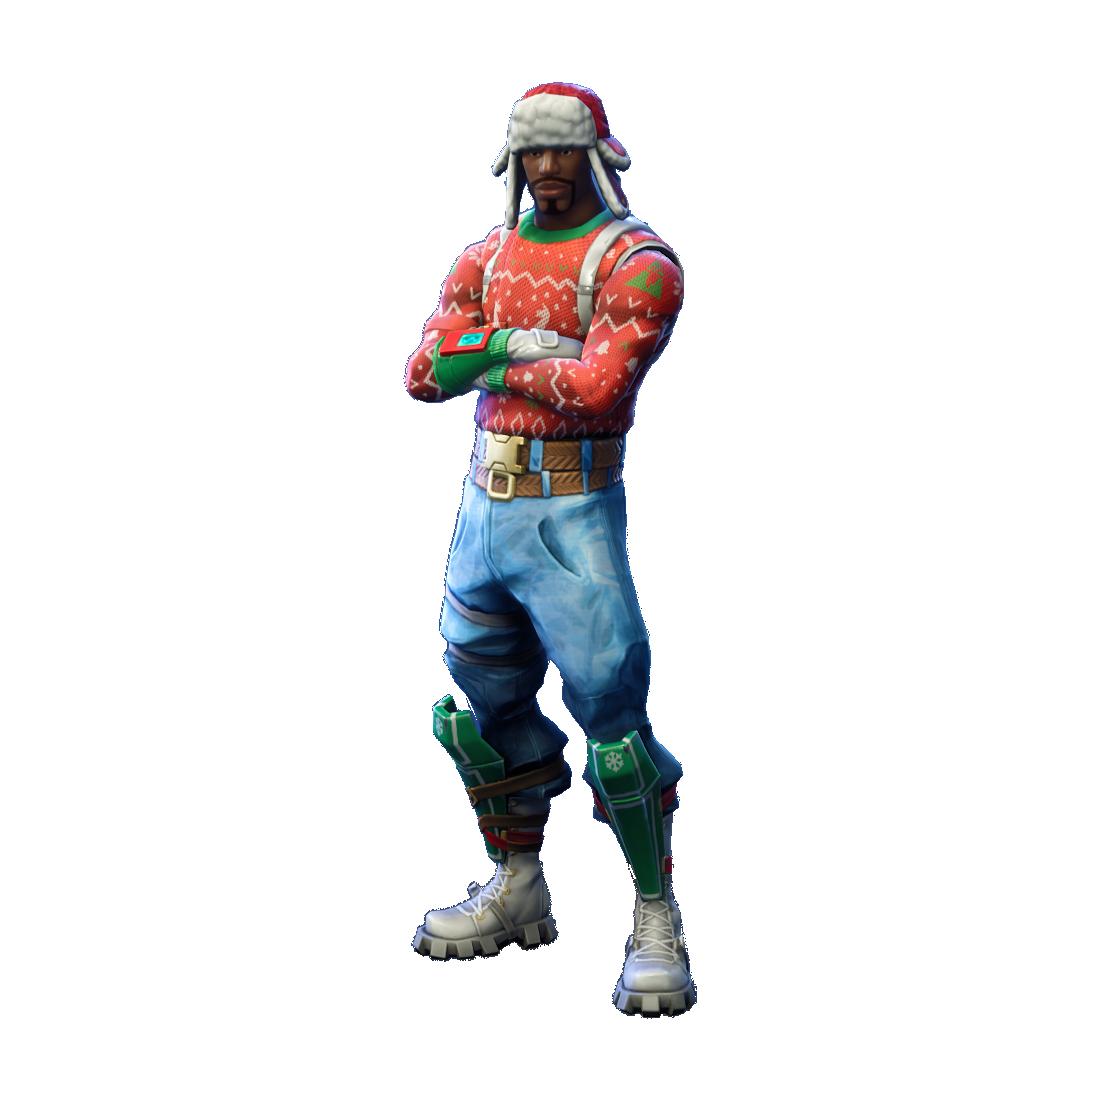 Yuletide Ranger - Yuletide Ranger (Святочный рейнджер)